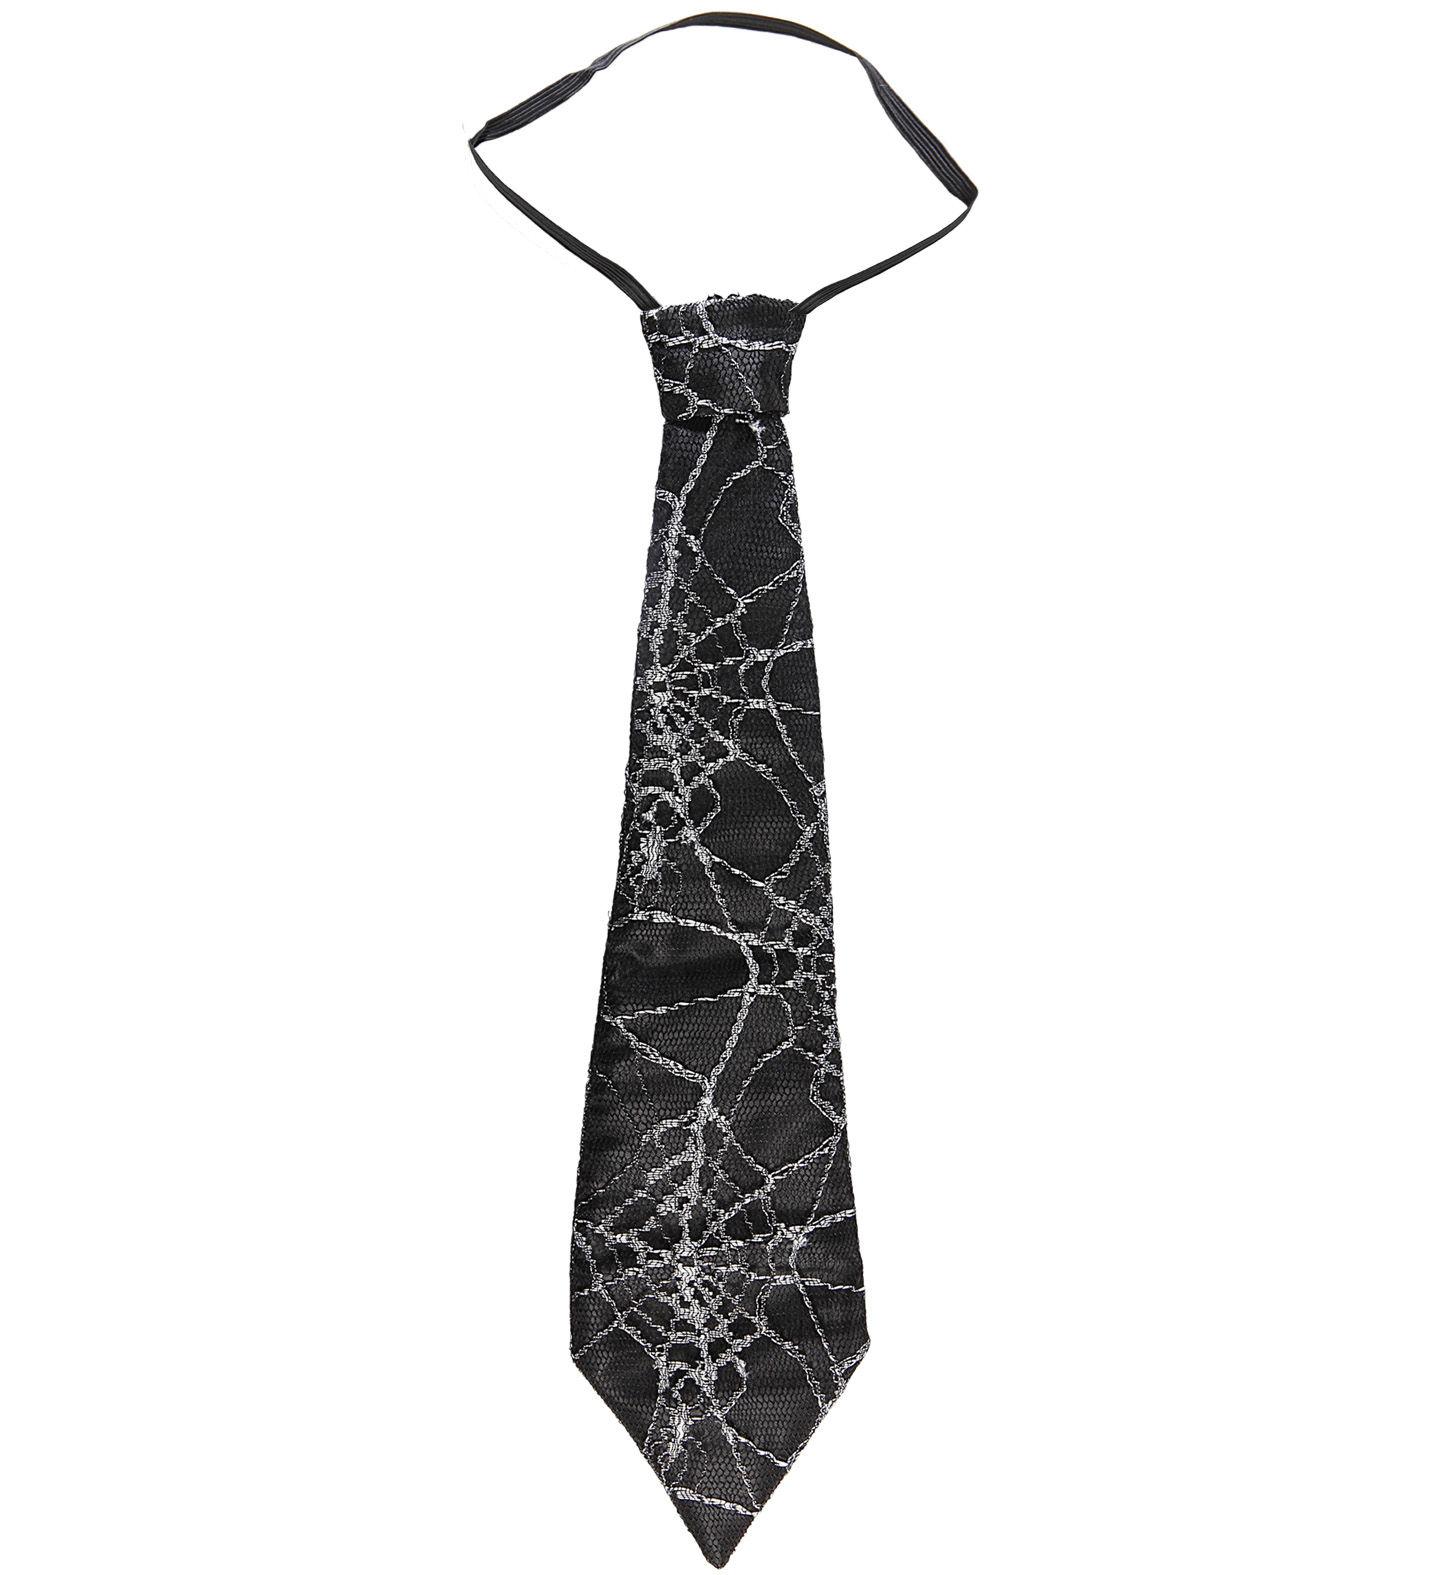 Kravata s pavučinou (45 cm)